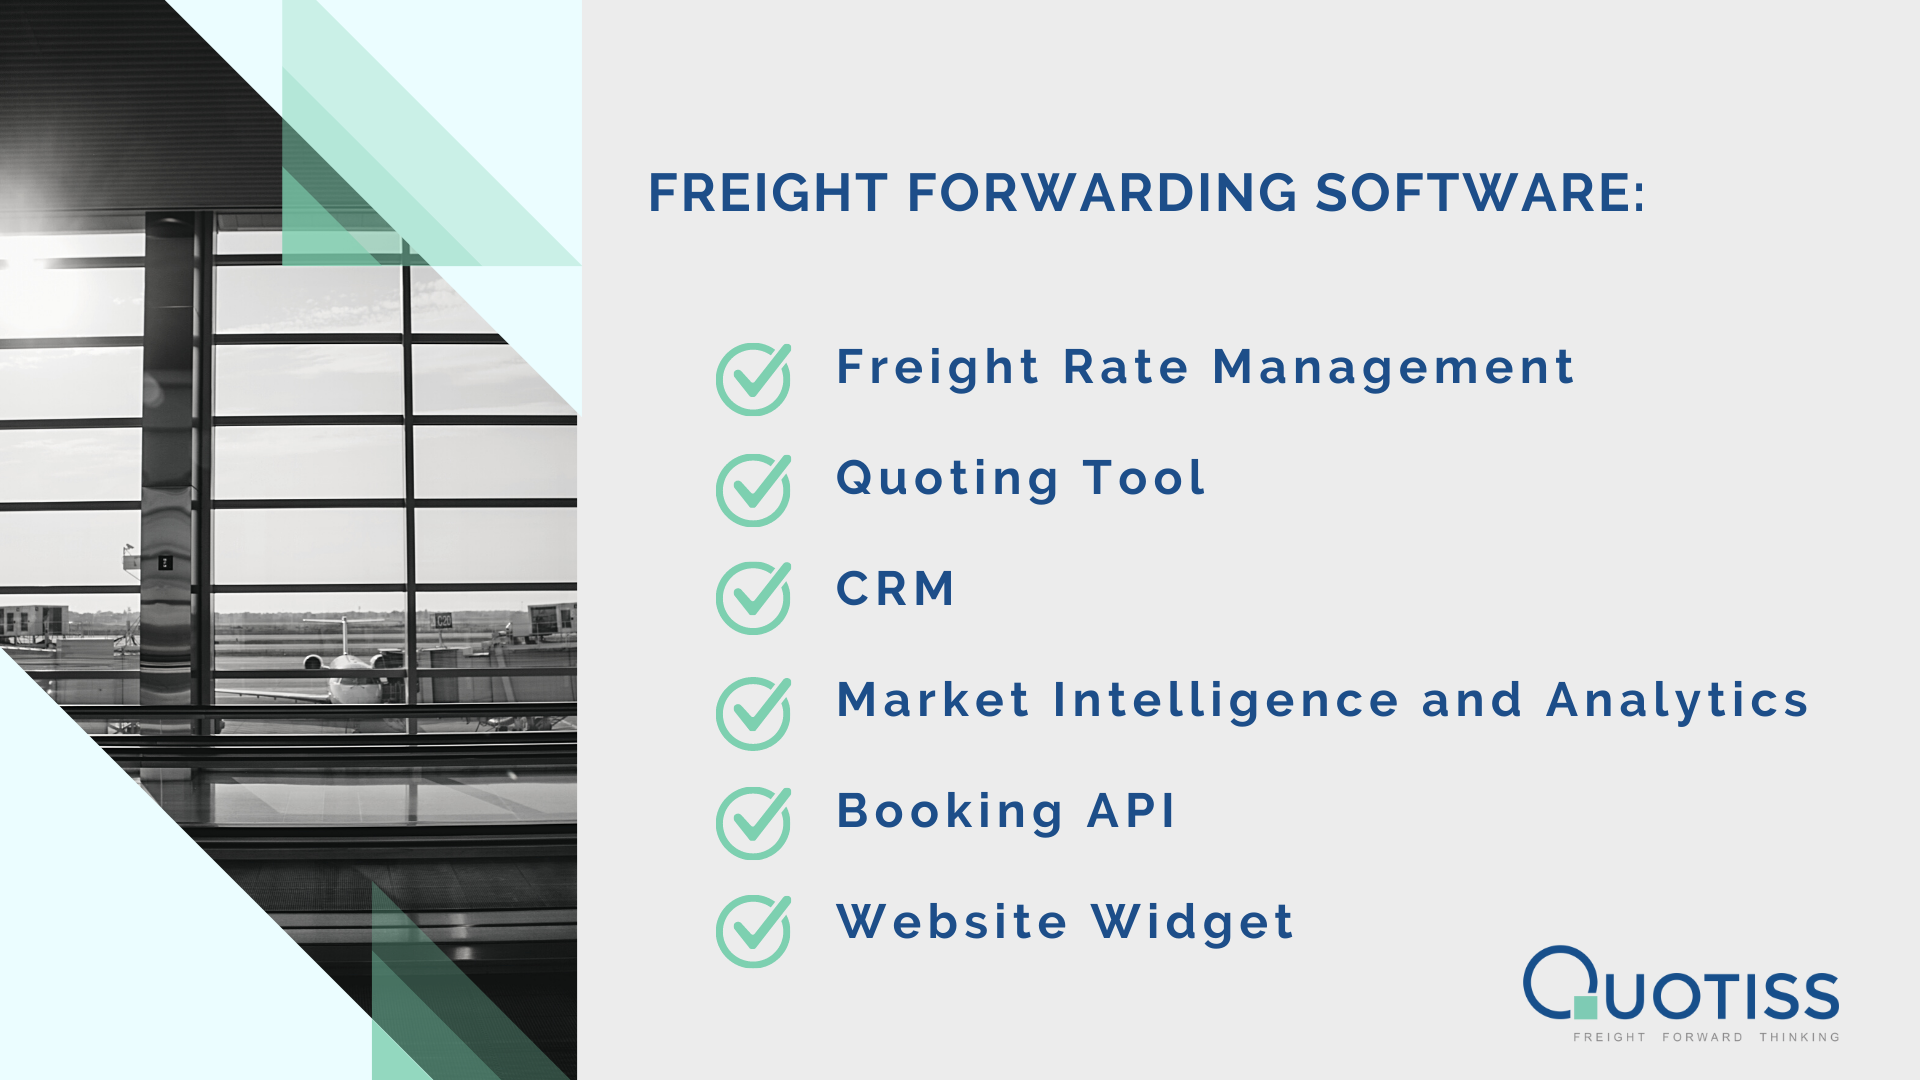 Quotiss - Freight Forwarding Software